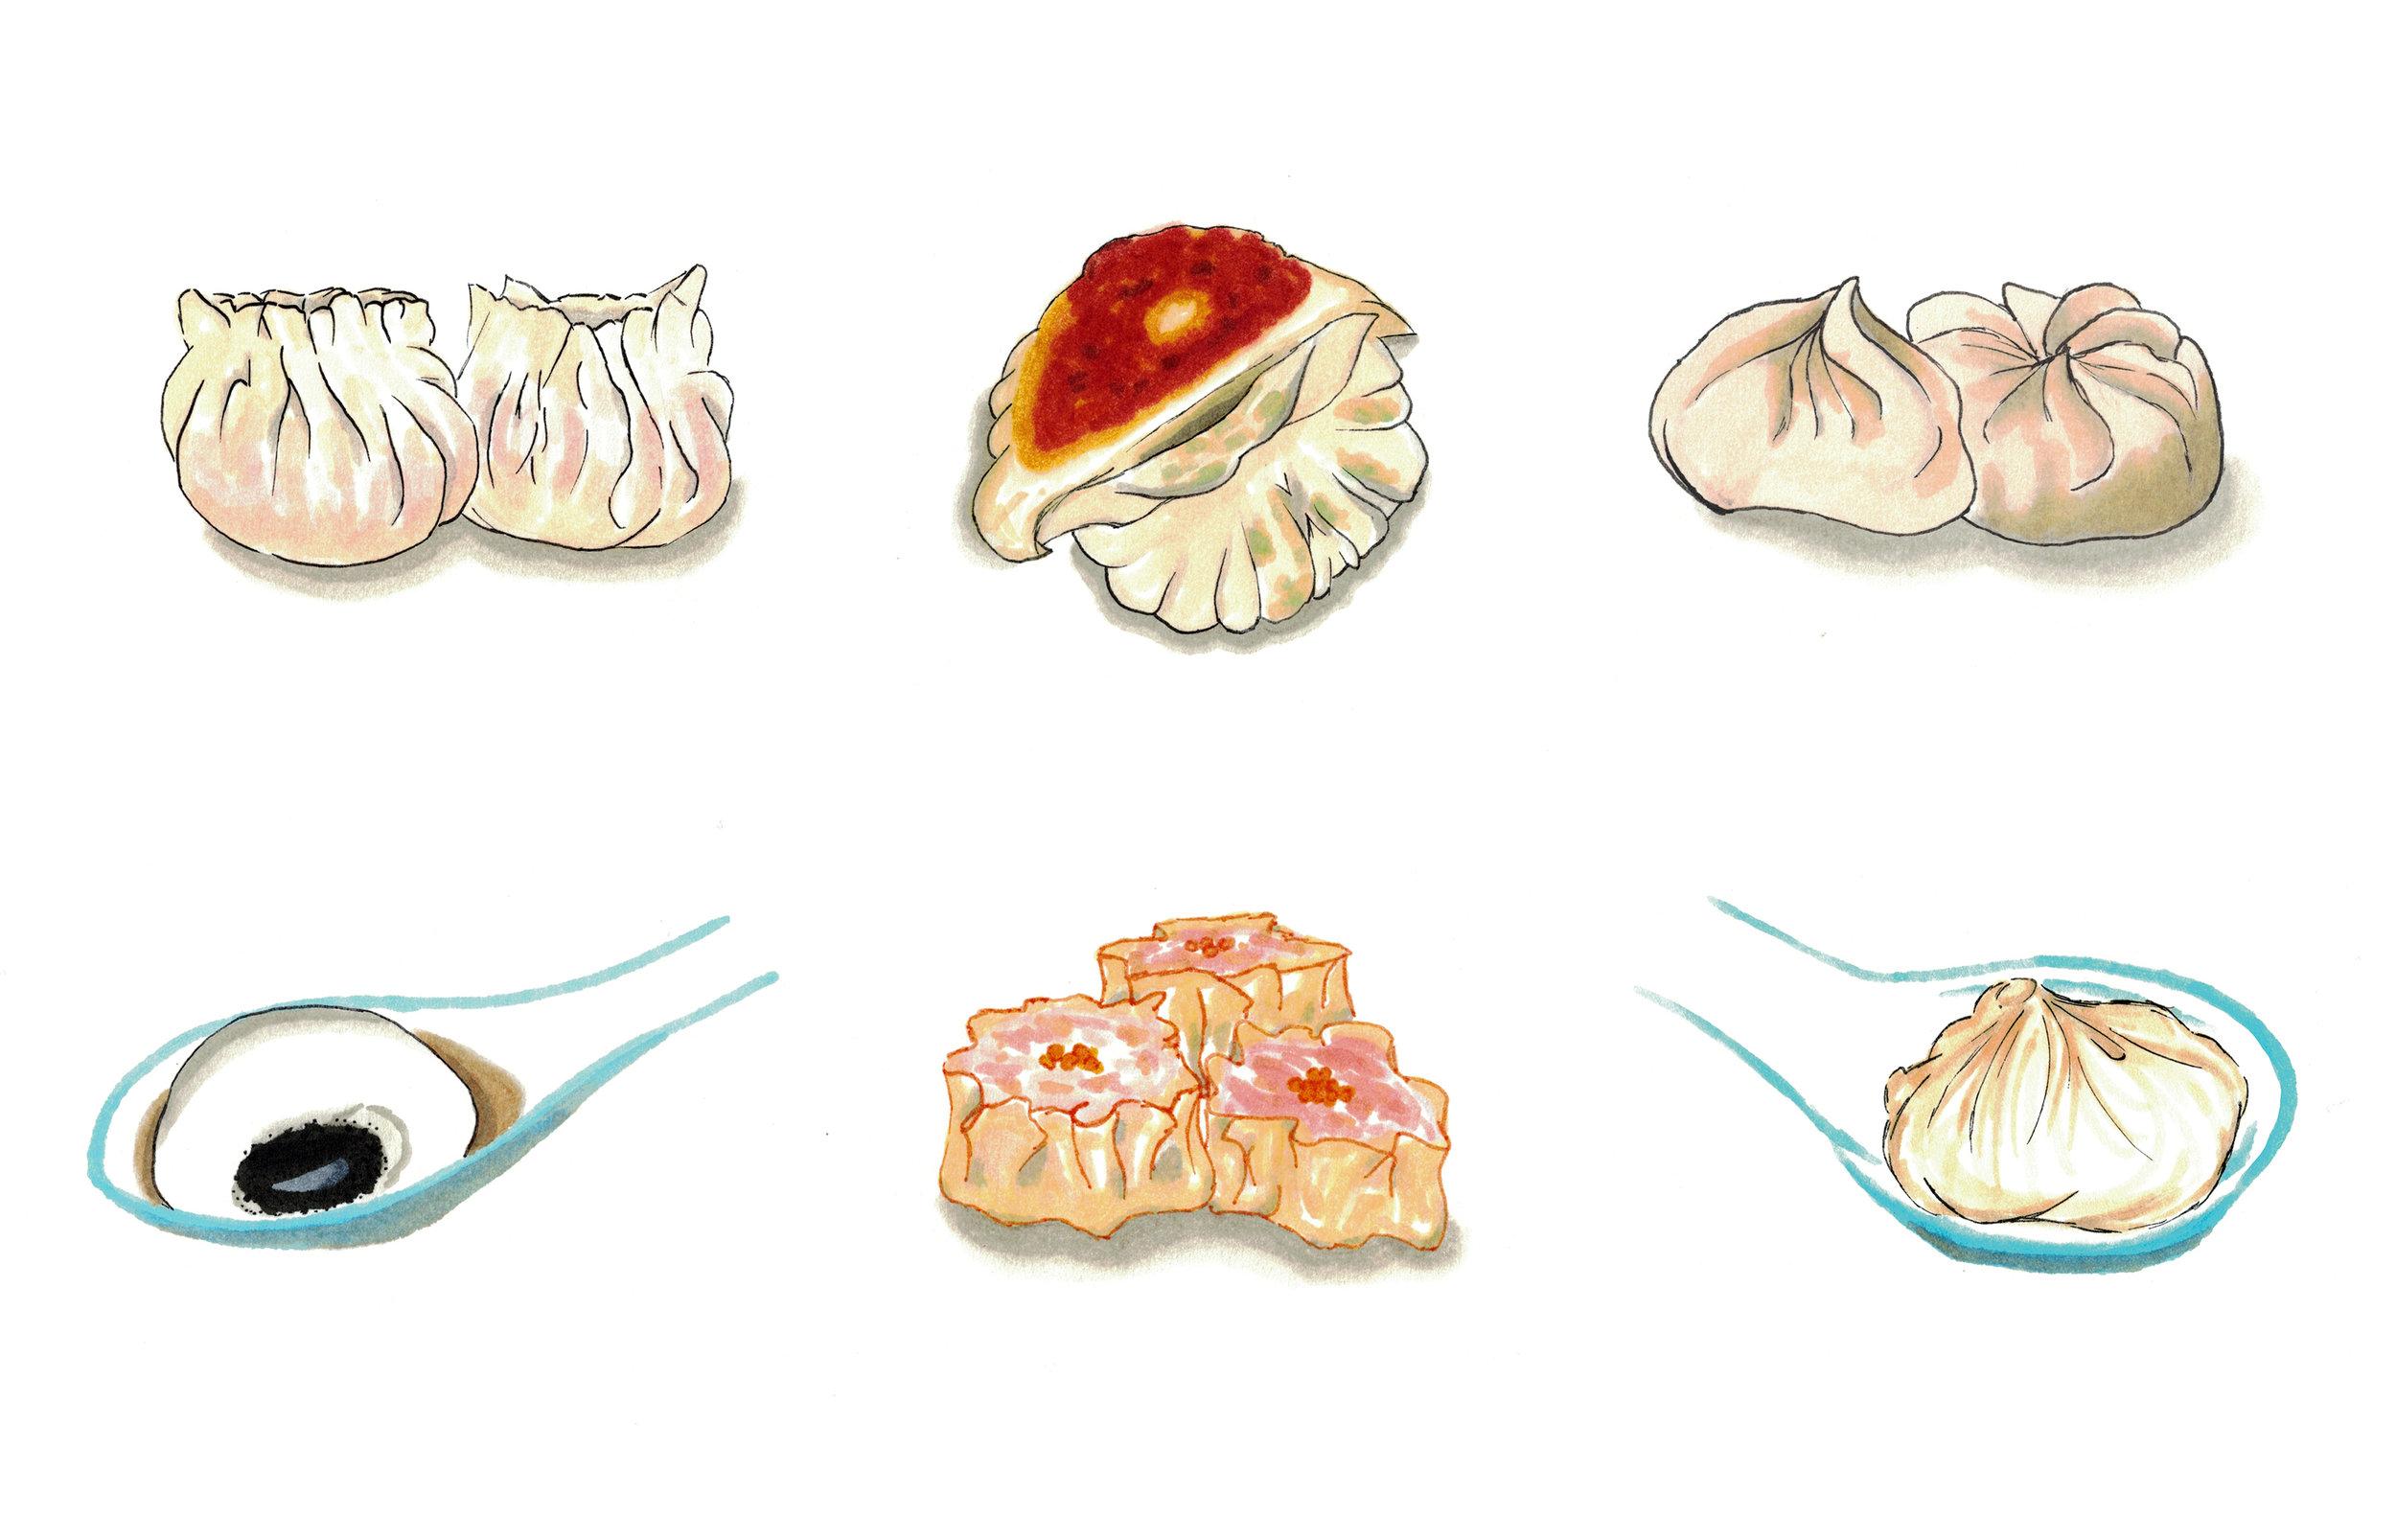 Six kinds of dumplings for  SupChina.com